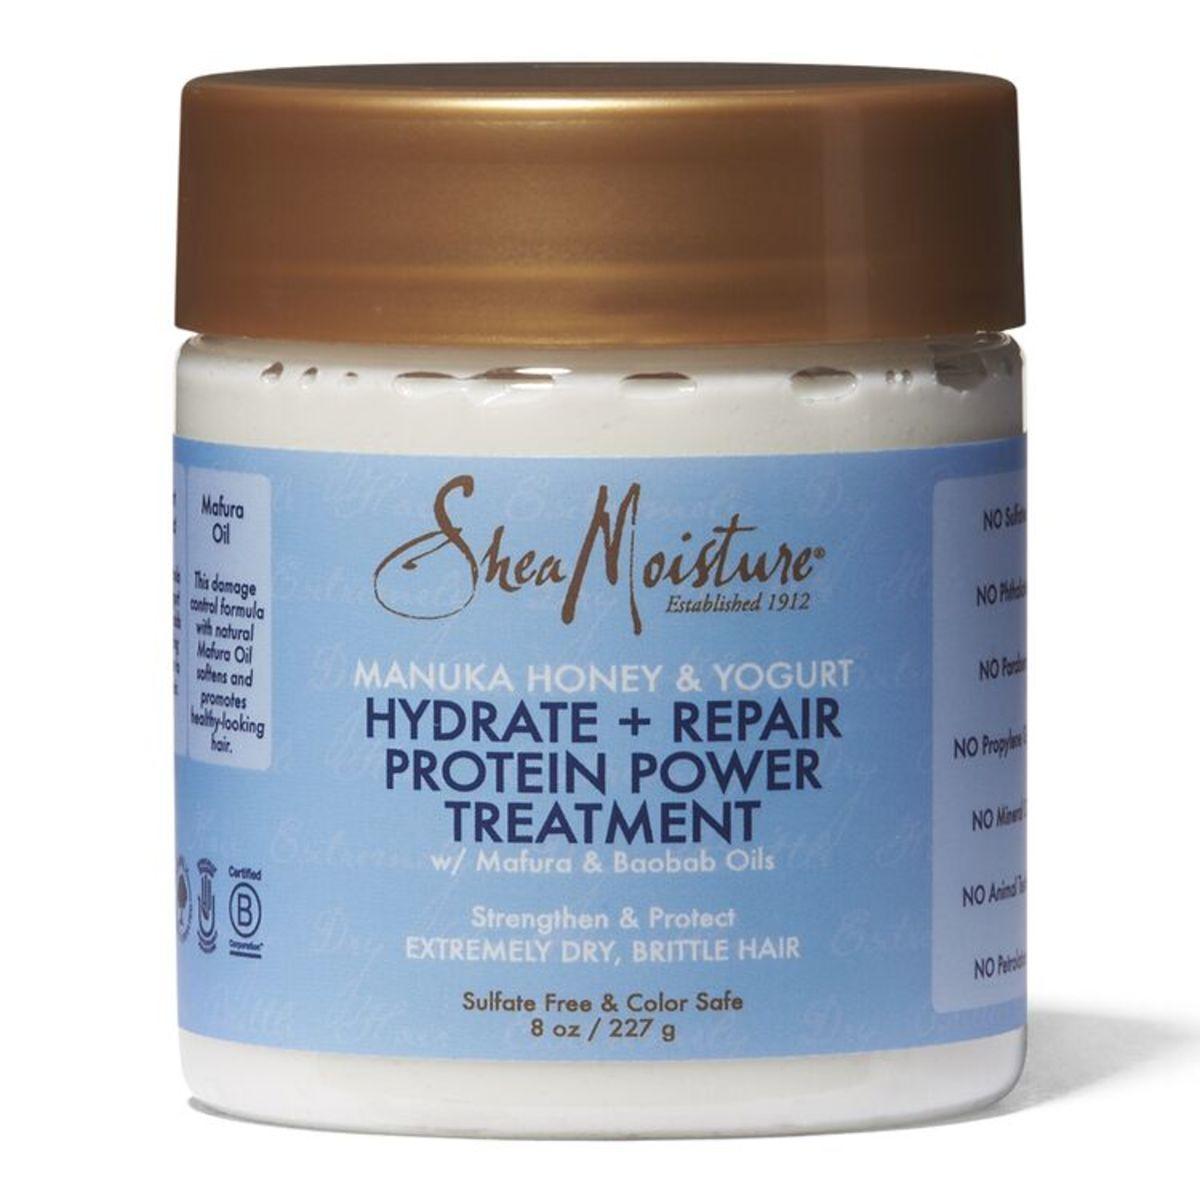 Shea Moisture Manuka Honey & Yogurt Hydrate + Repair Protein Power Treatment, $11.49, available here.